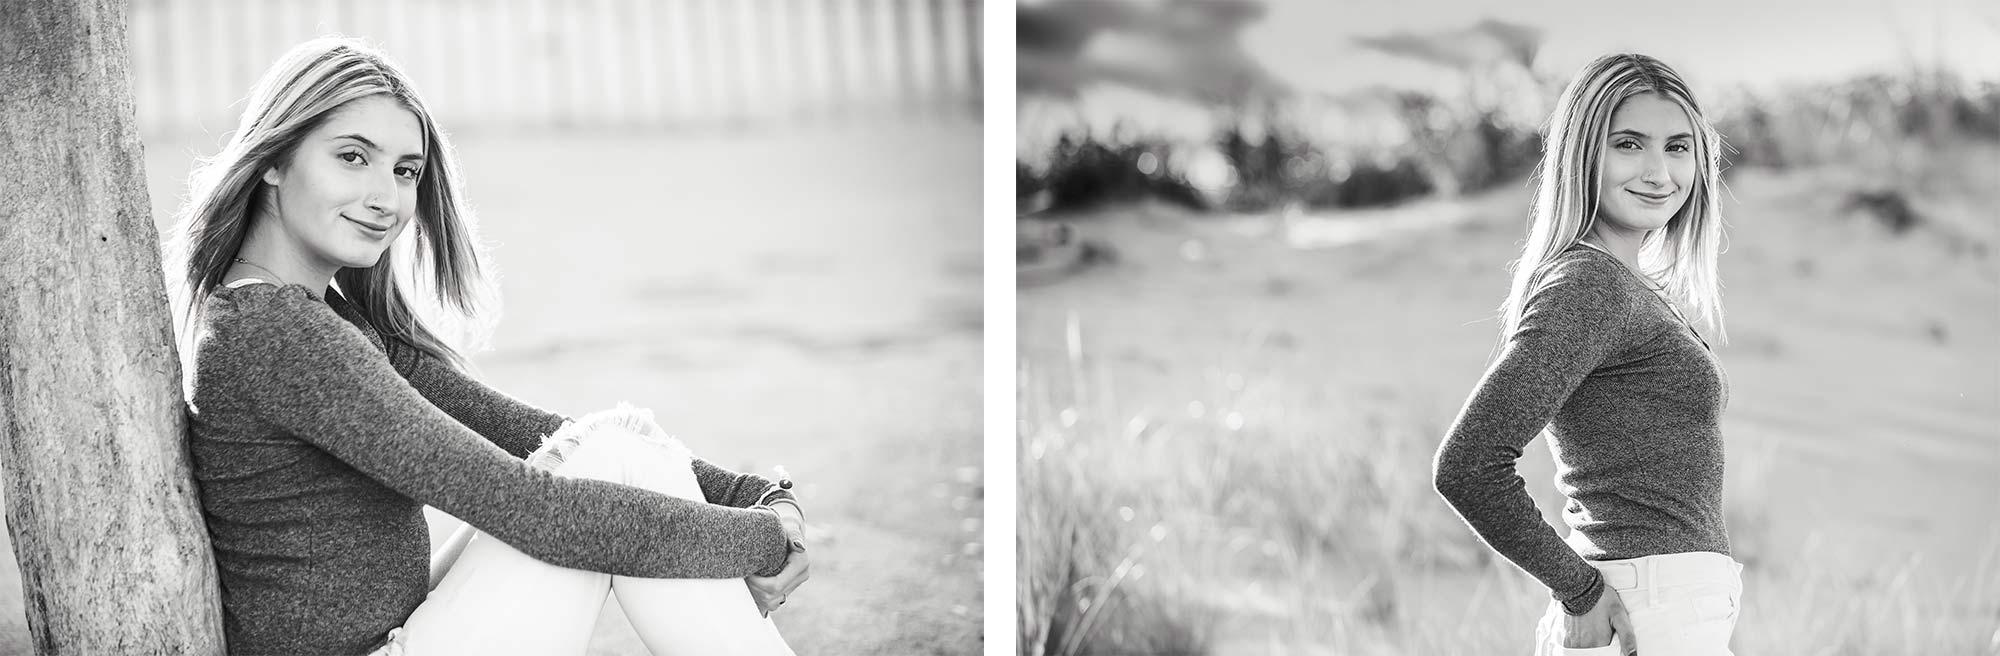 Beach Senior Portraits | Stephen Grant Photography